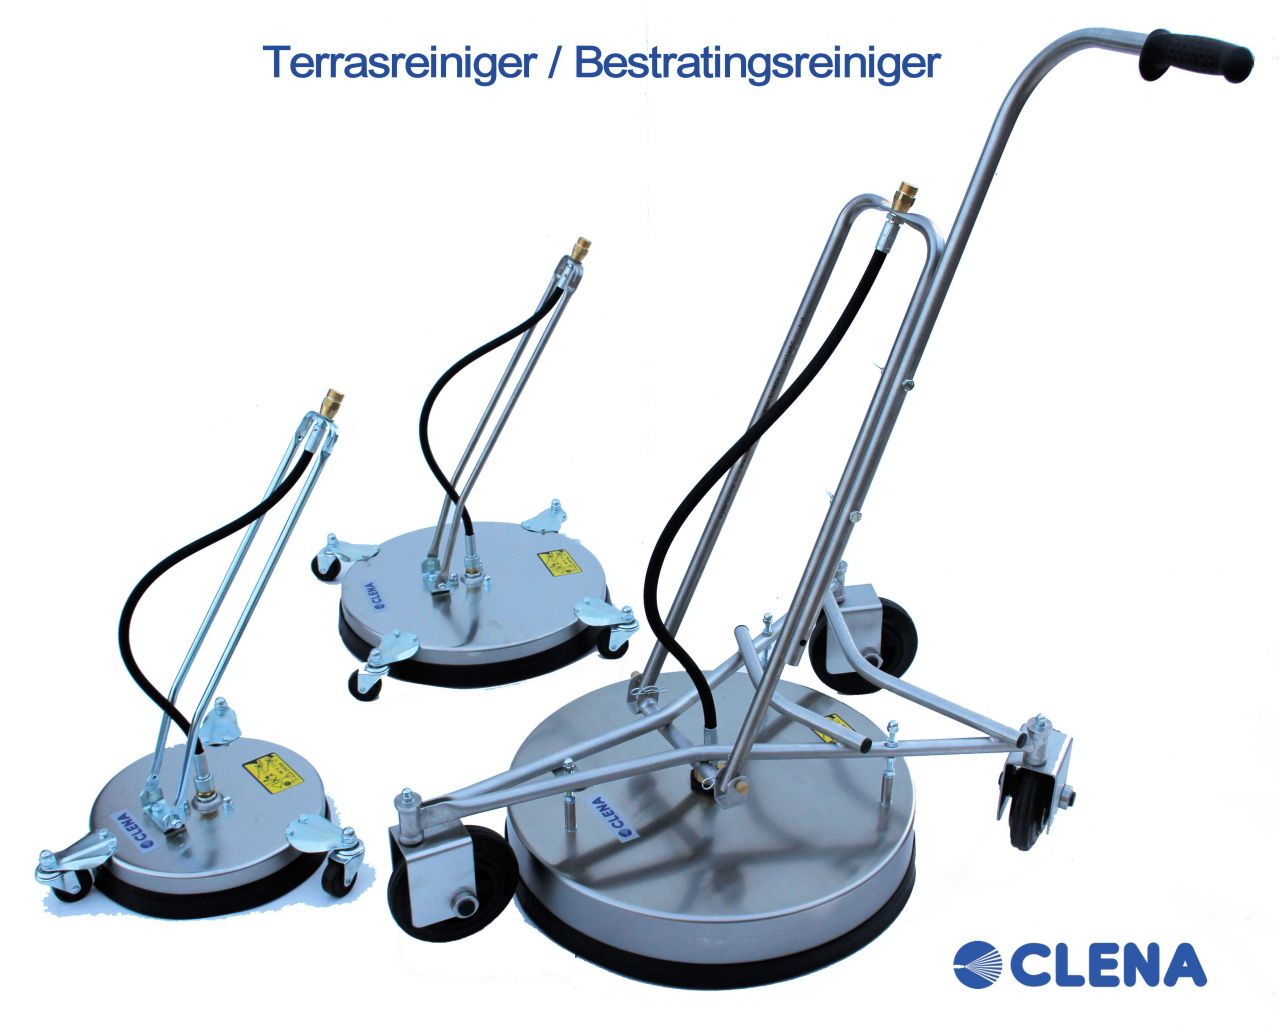 GEZOCHT verkooppunten Clena NEDERLAND